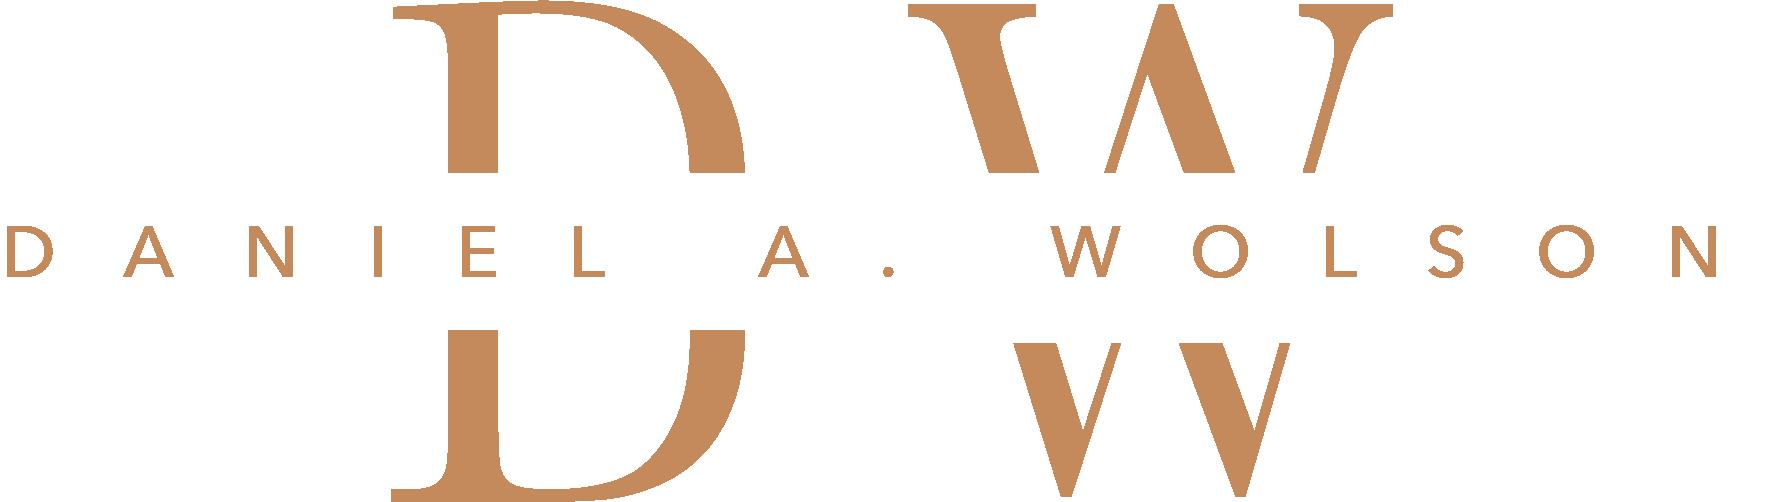 Daniel A. Wolson Logo